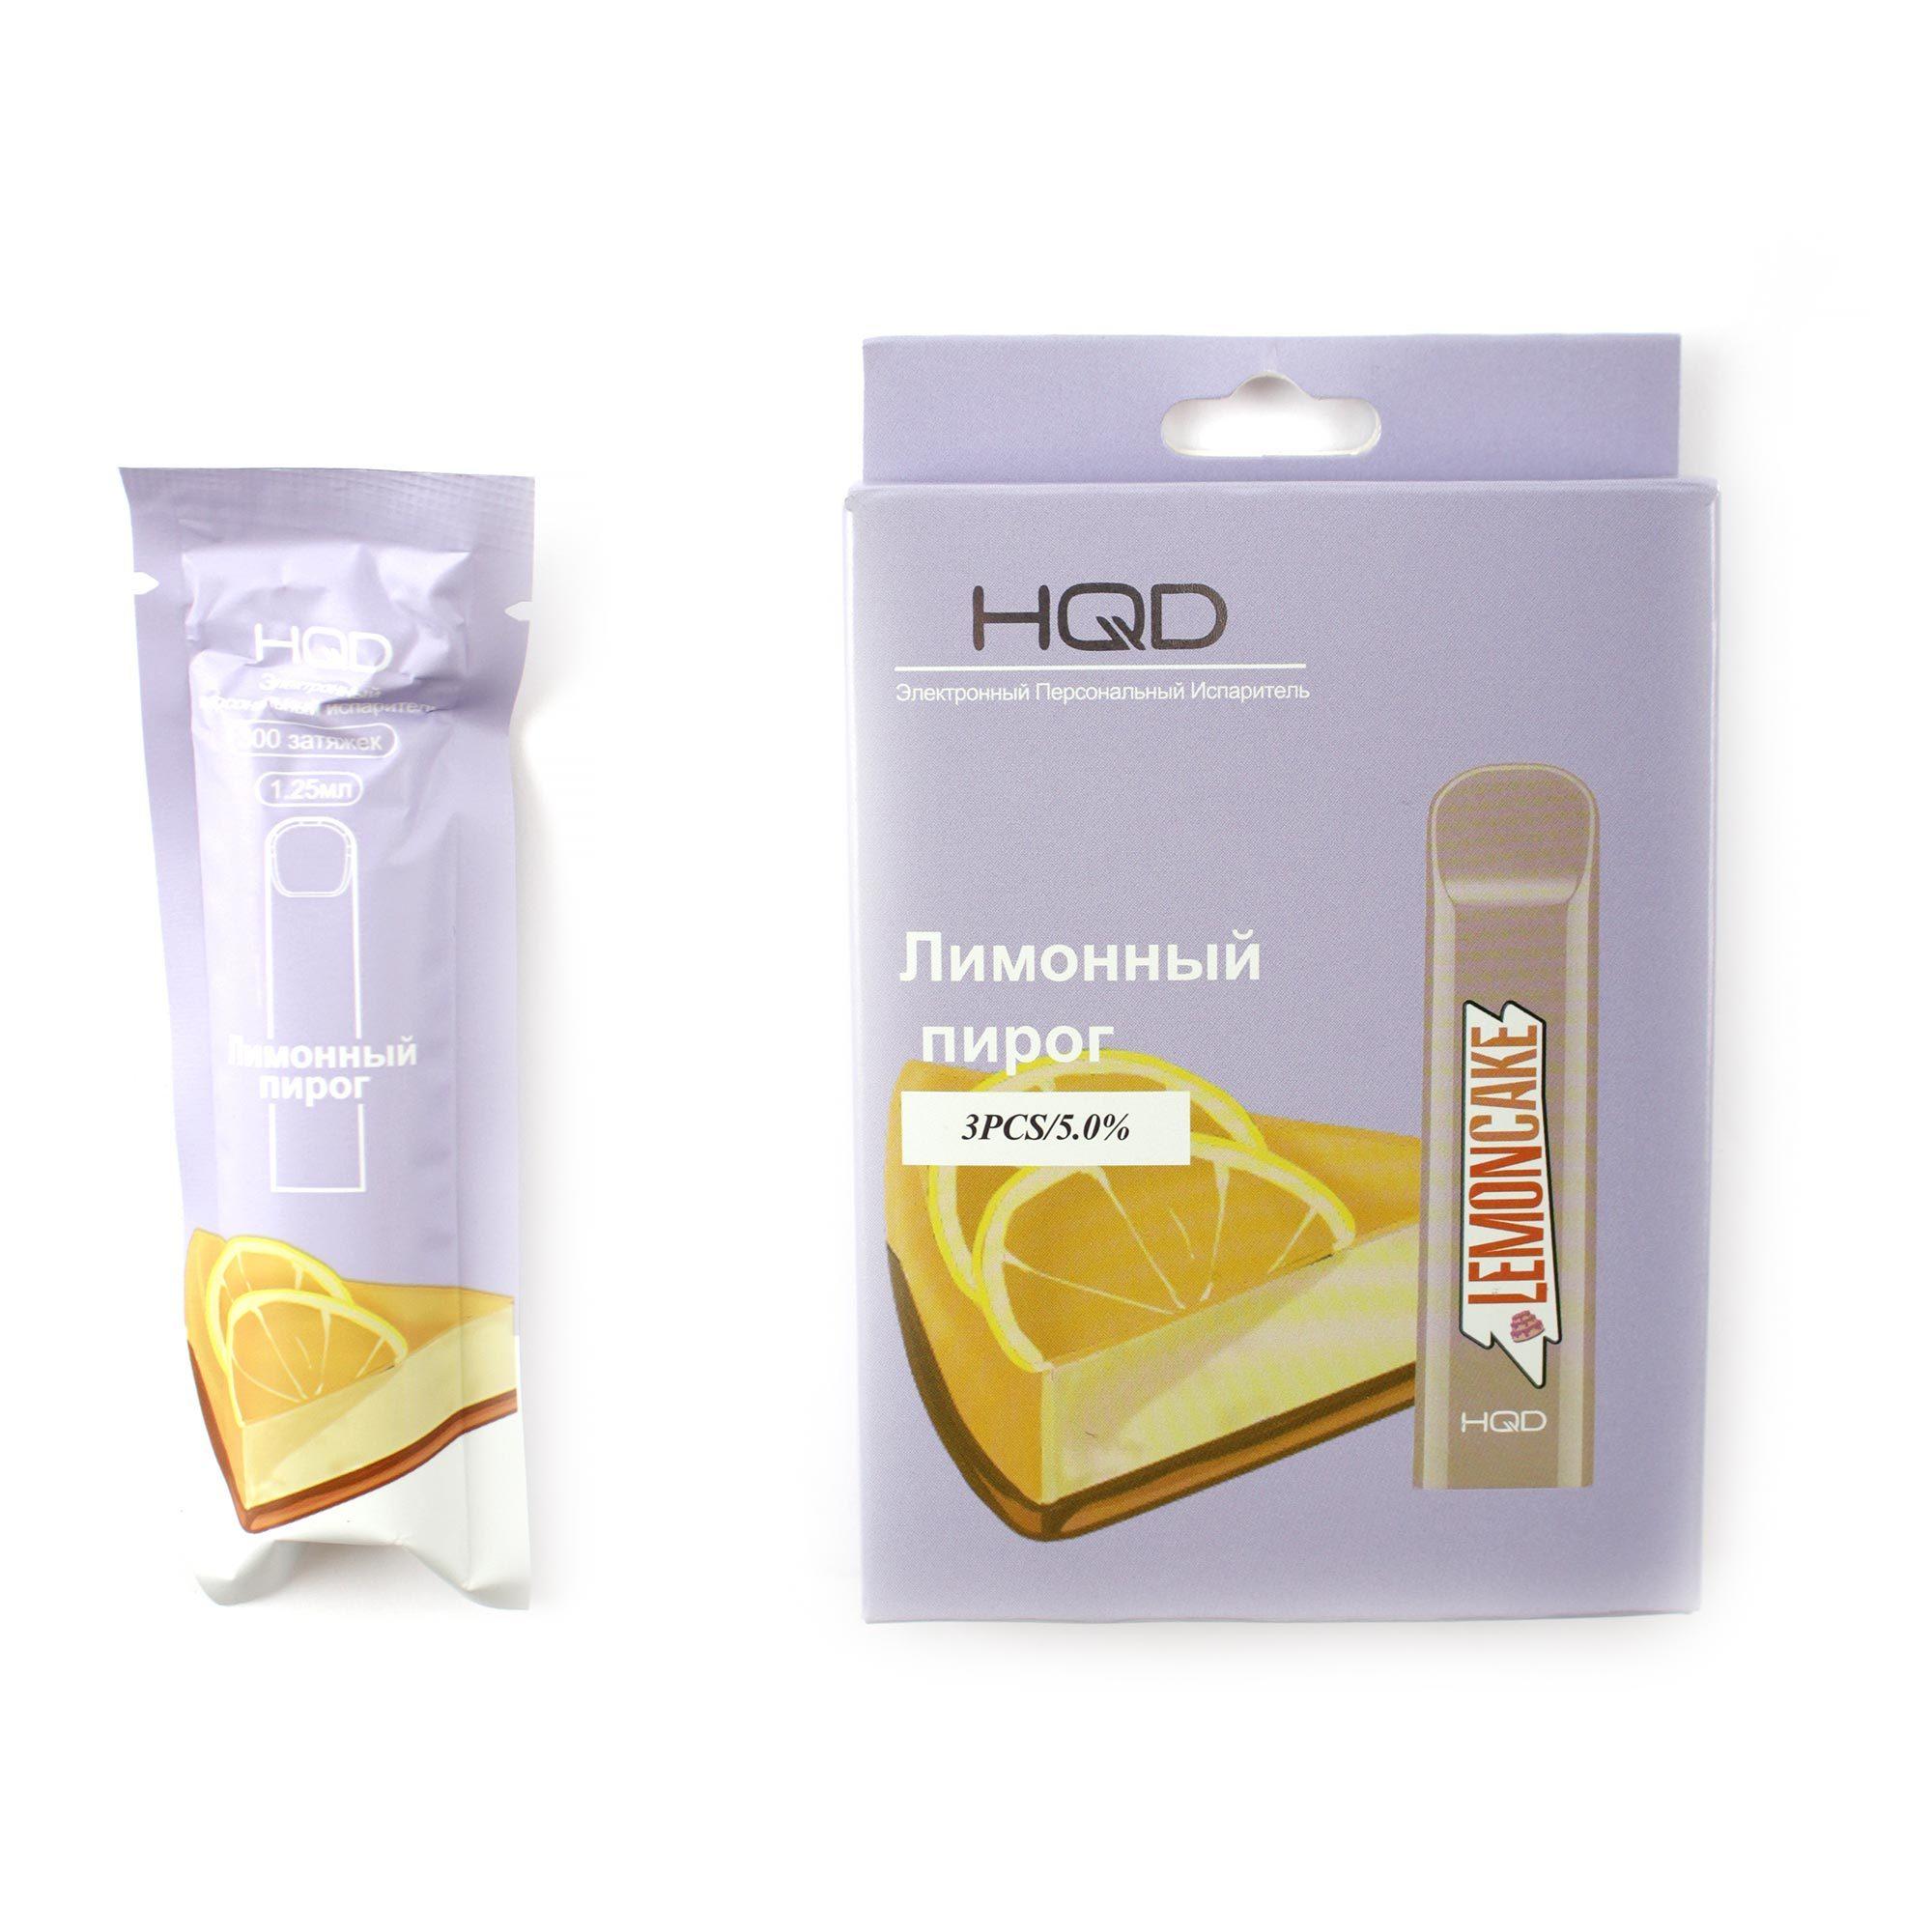 Одноразовая электронная сигарета HQD Lemon Cake (Чизкейк)